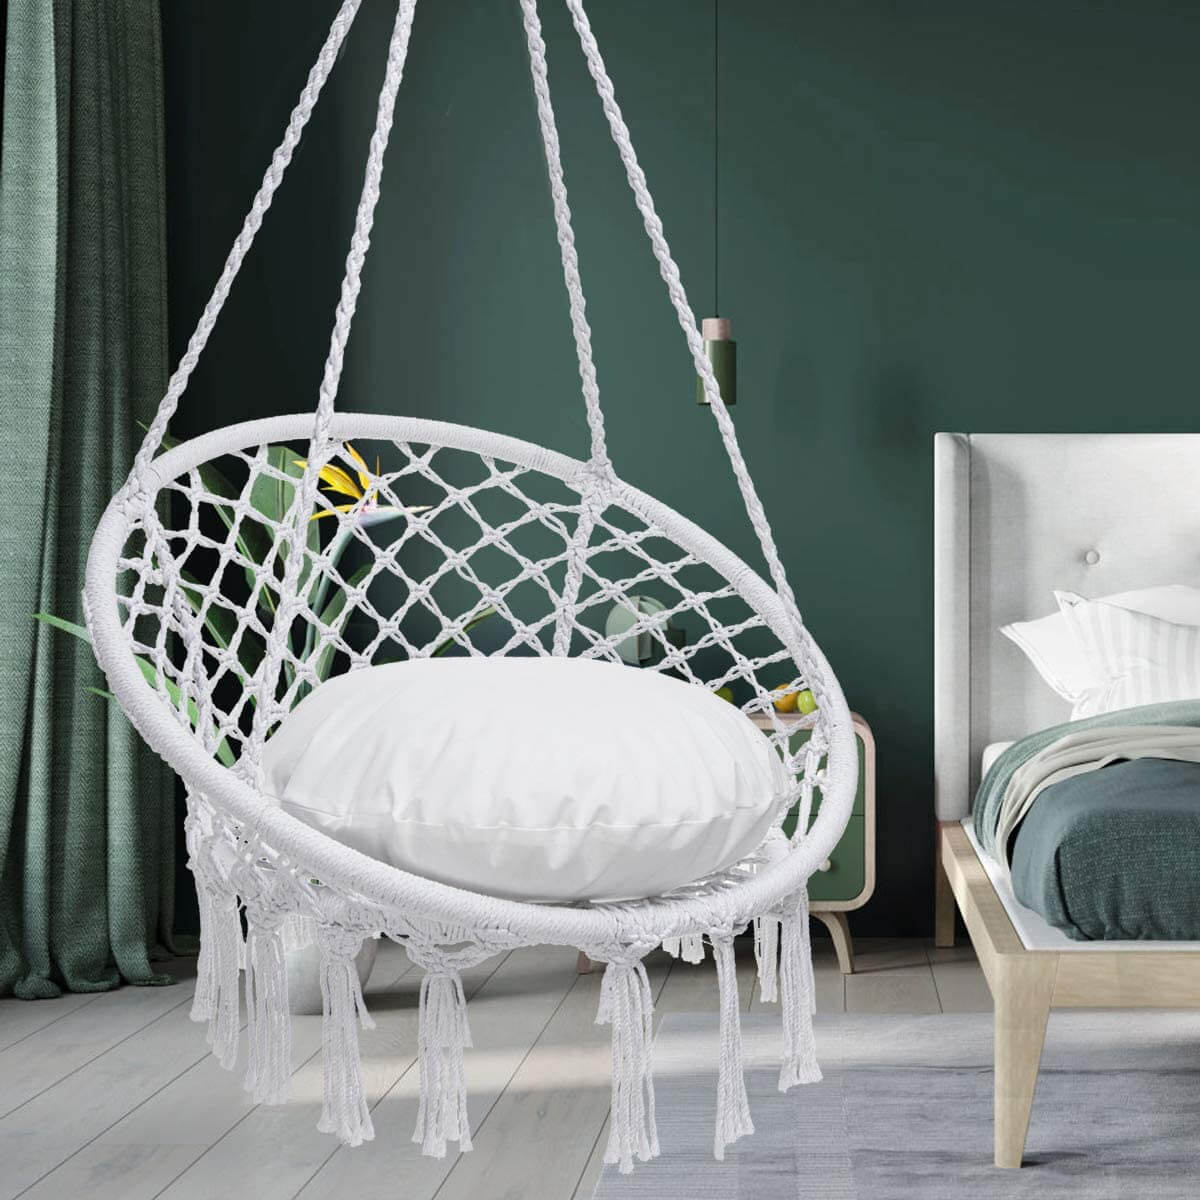 Hanging Macrame Hammock Swing Chair